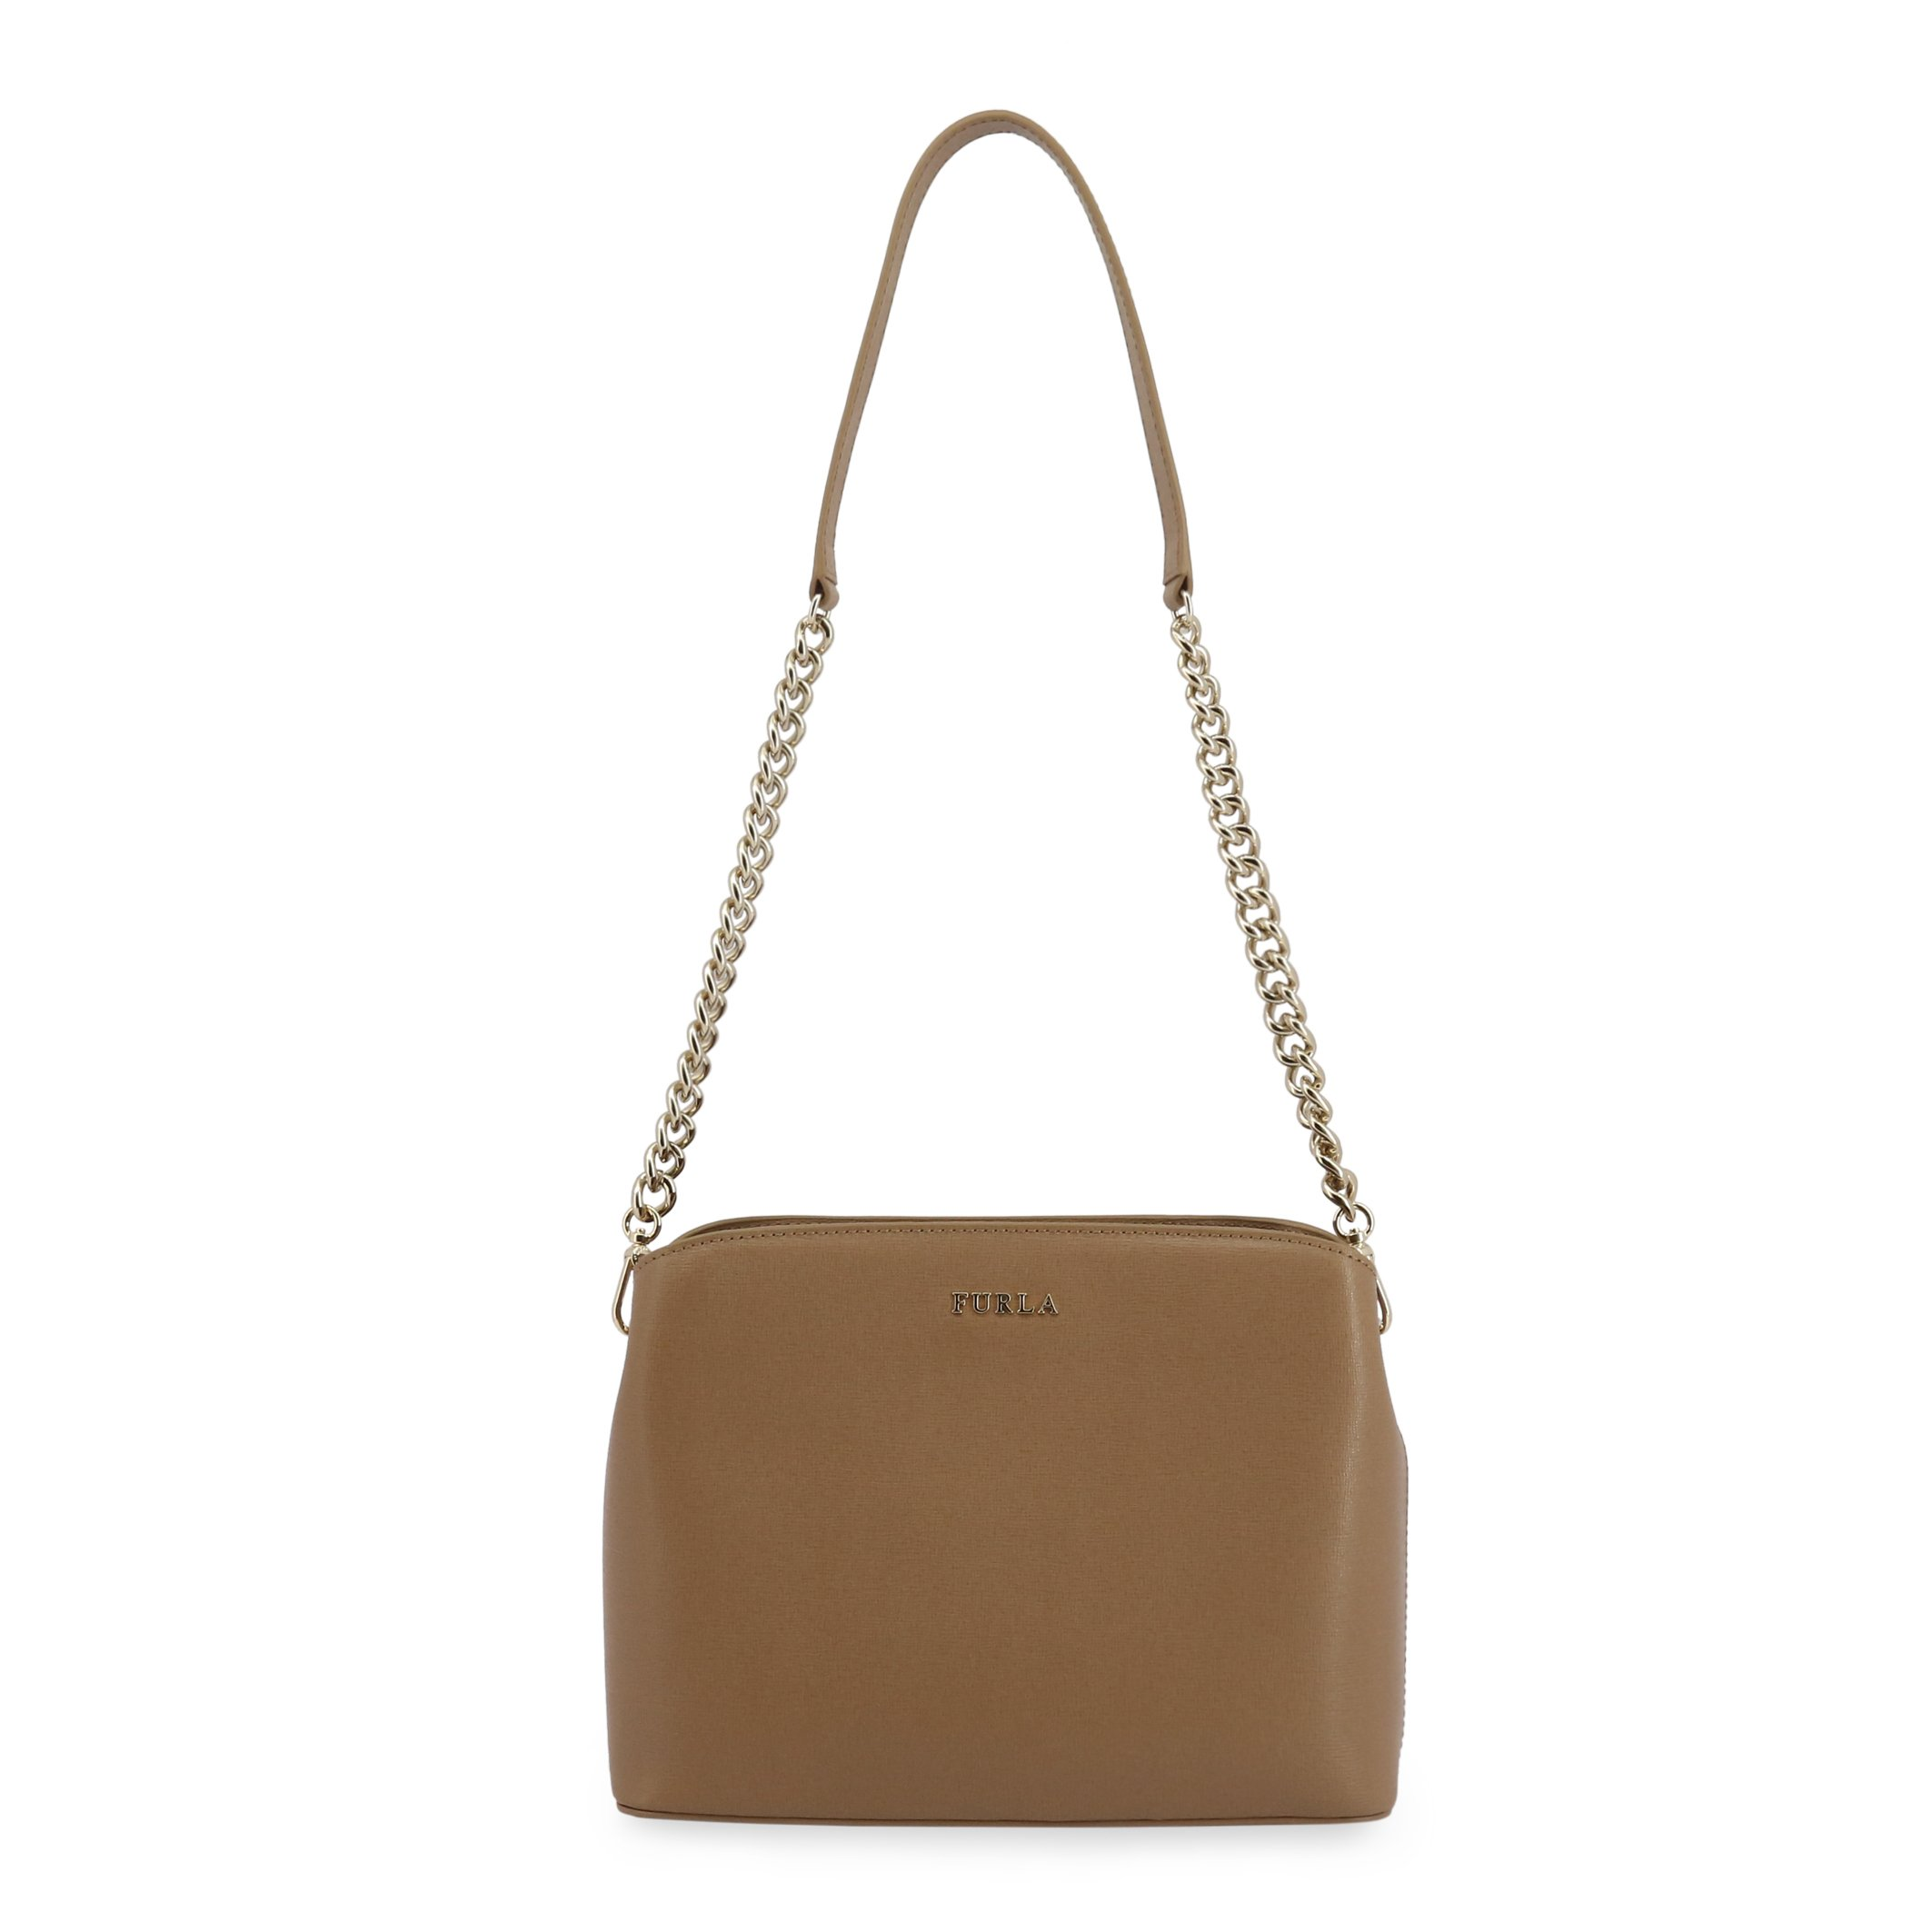 Furla Women's Shoulder Bag Various Colours TESSA_BWA9 - brown NOSIZE